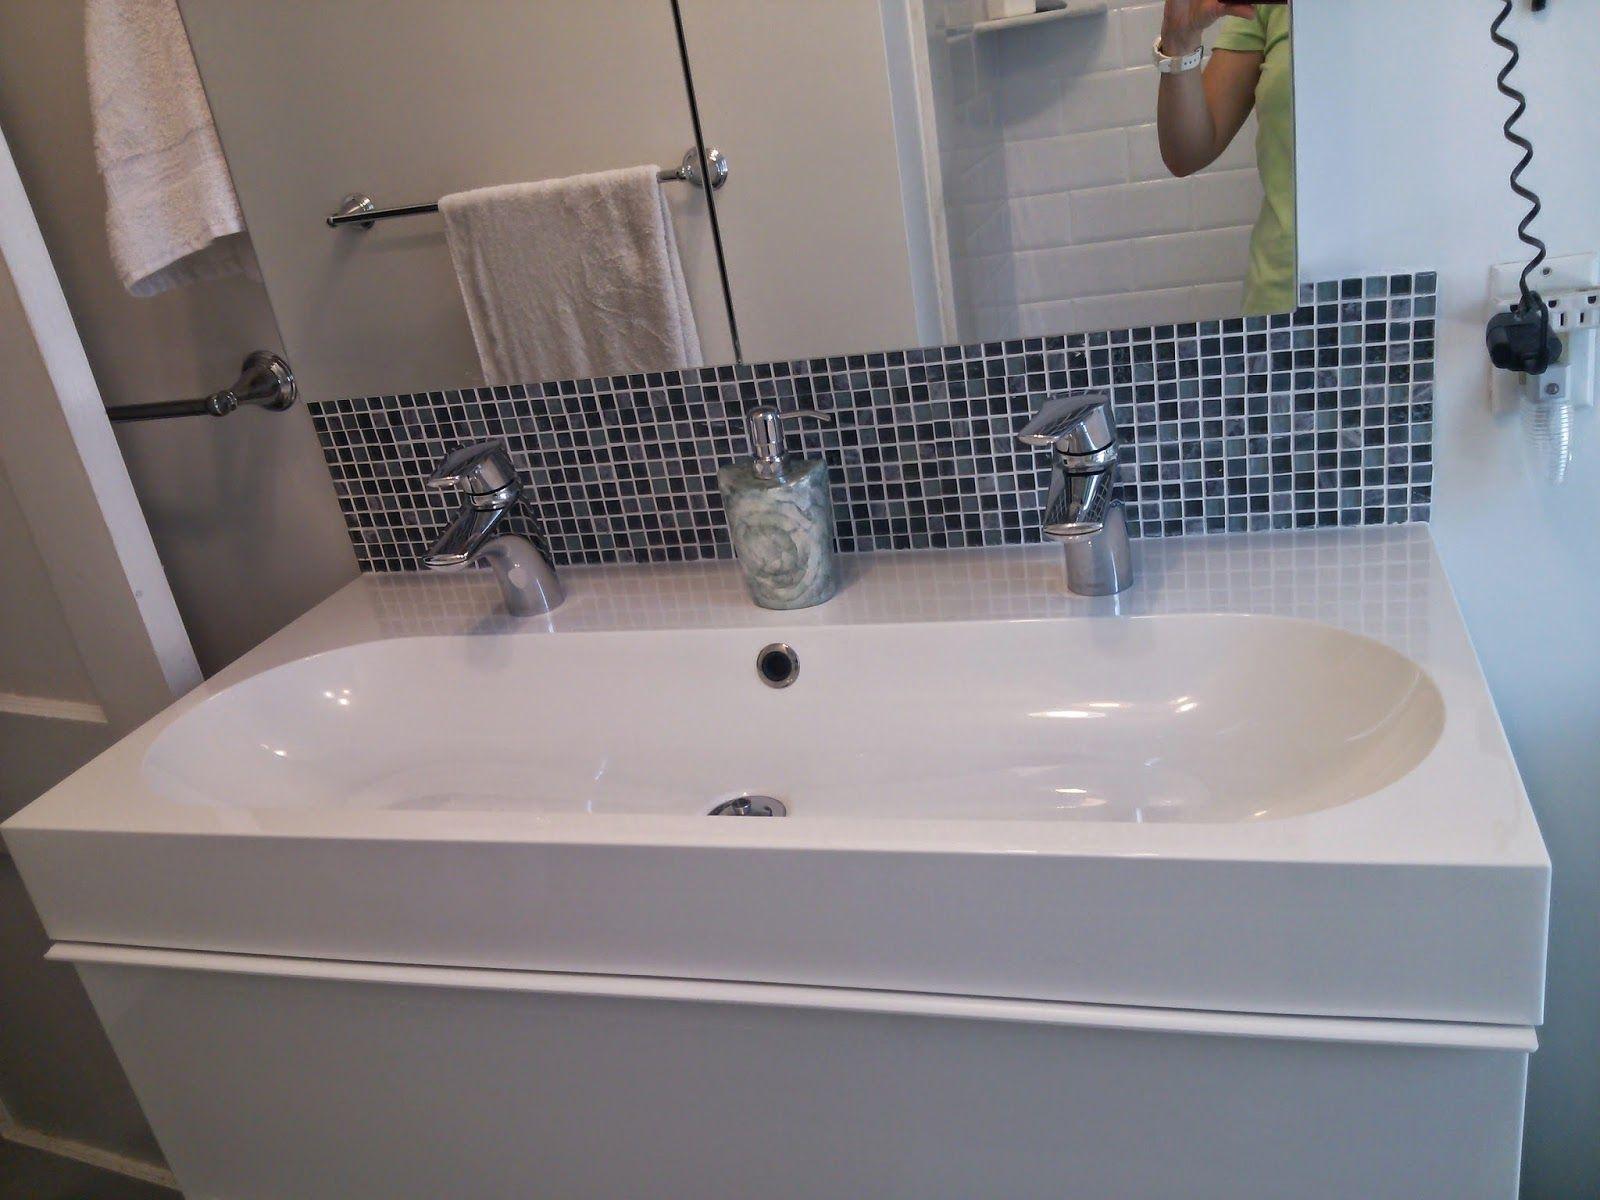 Interior Minimalist White Tone Trough Sink With Two Chrome Metal Faucet Trough Bathroom Sink With Two Faucets Trough Sink Bathroom Bathroom Faucets Trough Sink